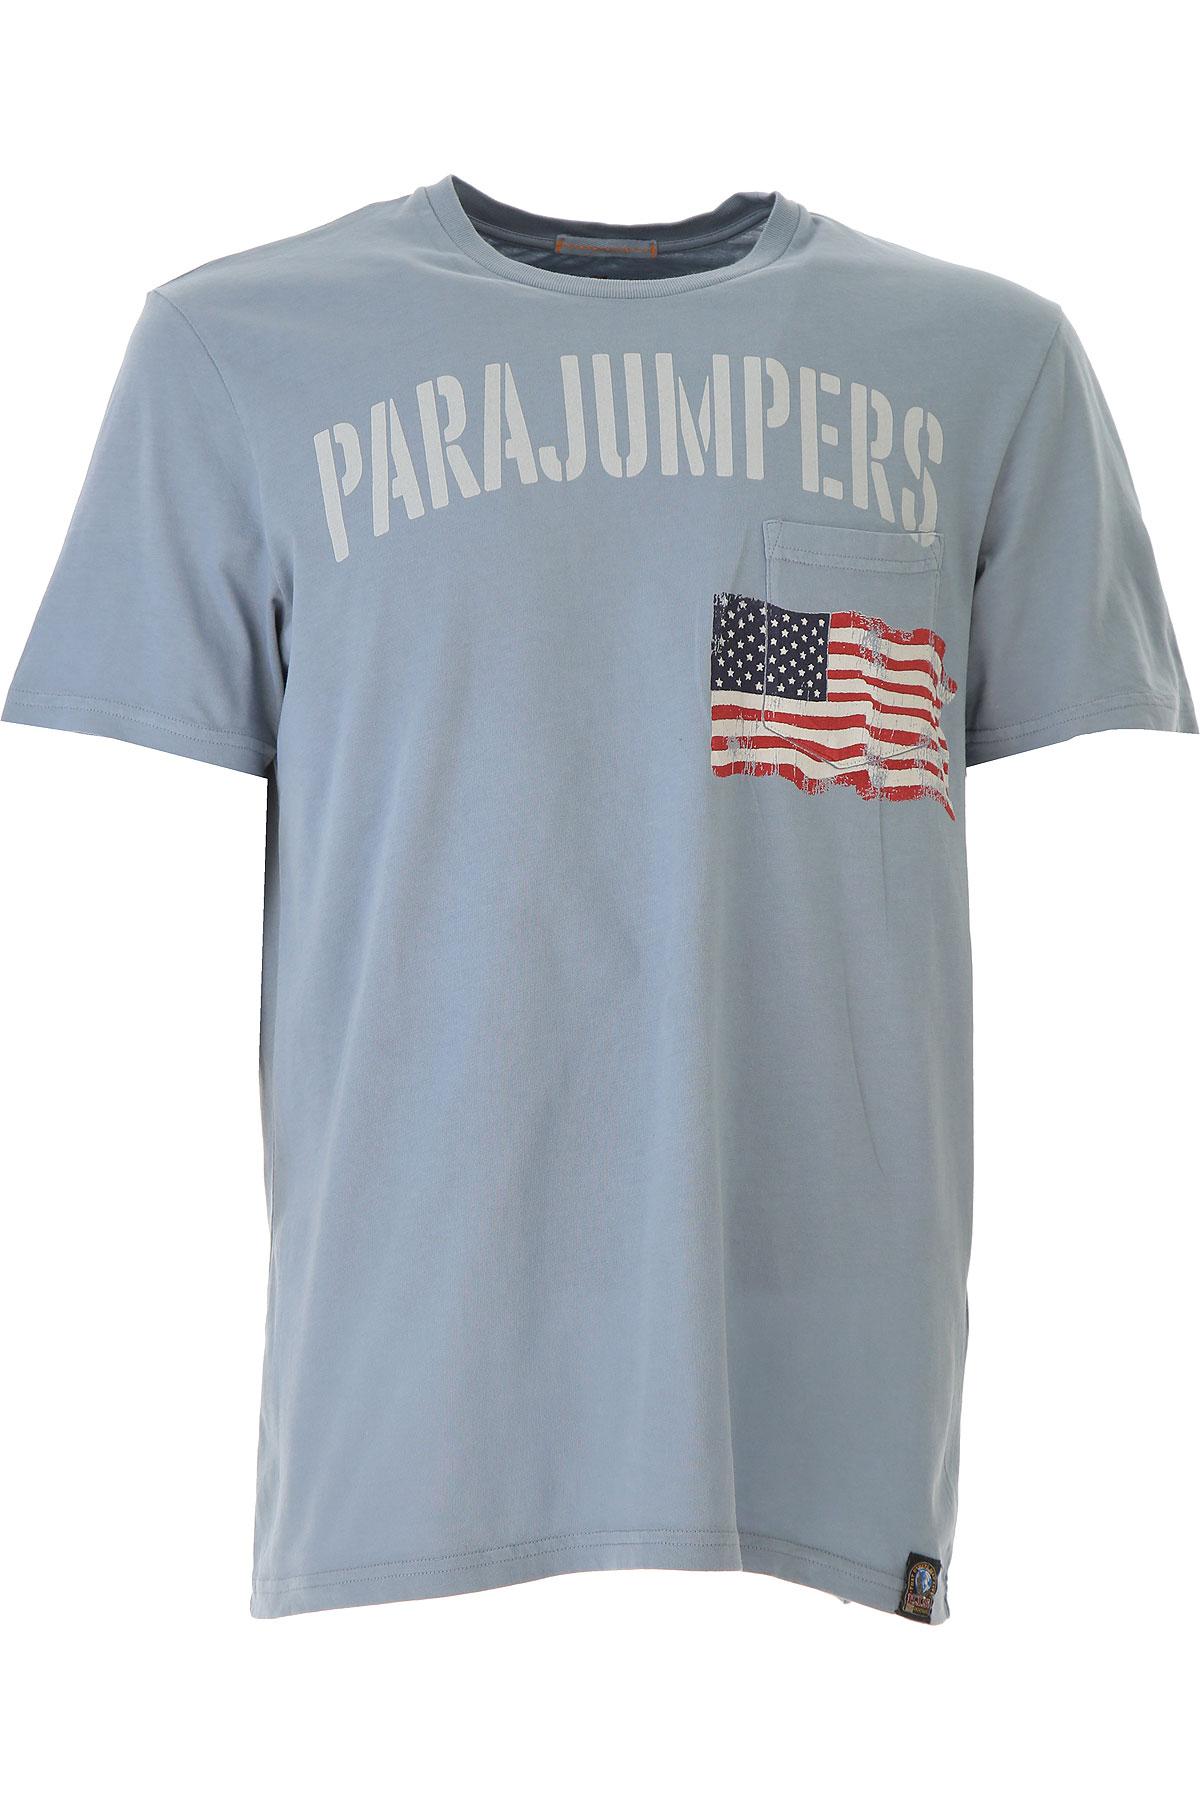 Image of Parajumpers T-Shirt for Men On Sale, dust Blue, Cotton, 2017, M